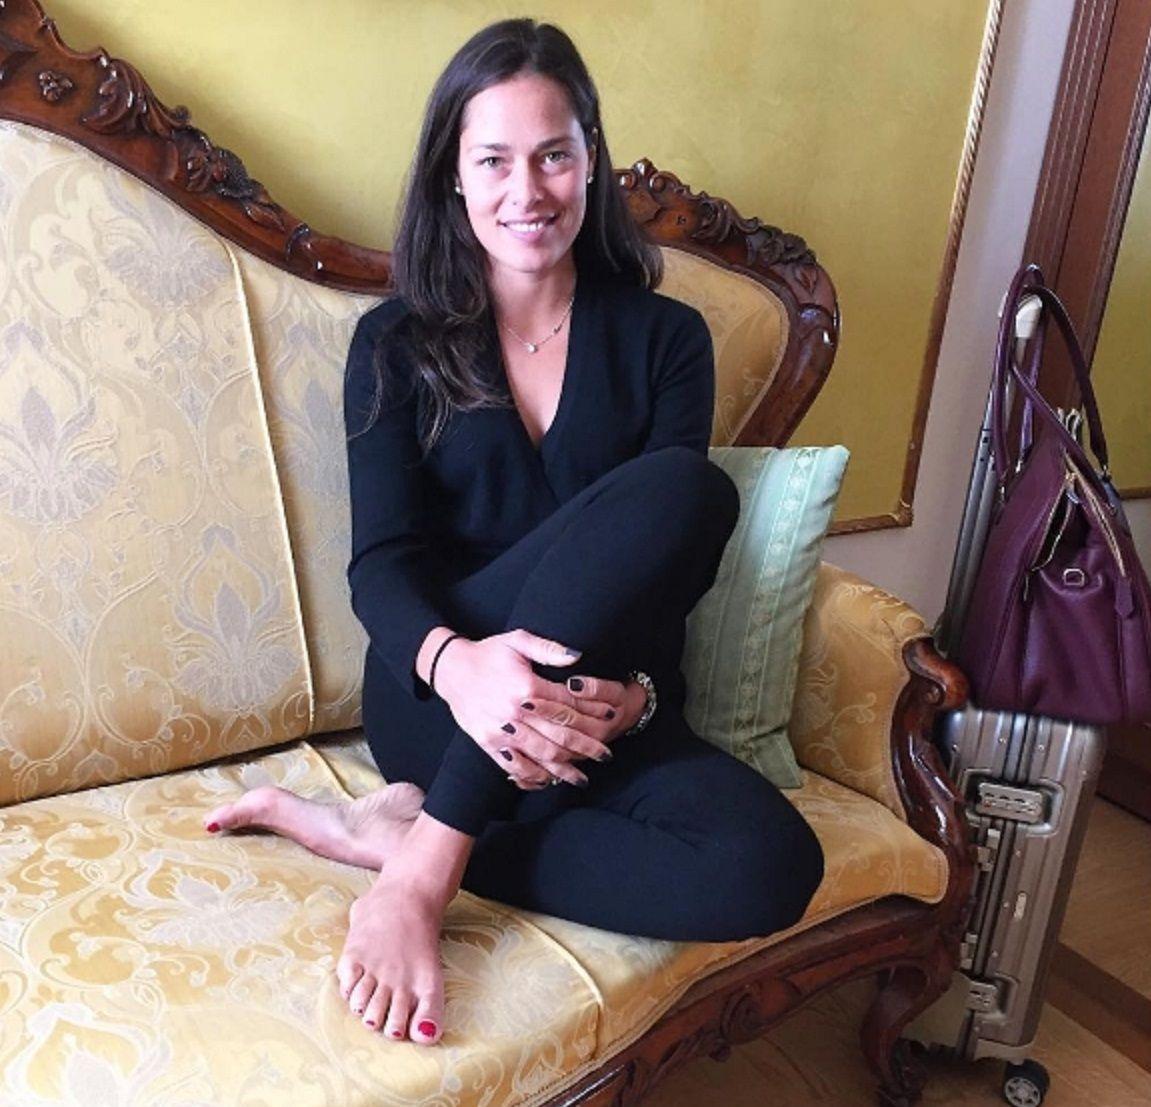 Ana Ivanovic Feet pinnadam marco on ex yu | ana ivanovic, celebrity feet